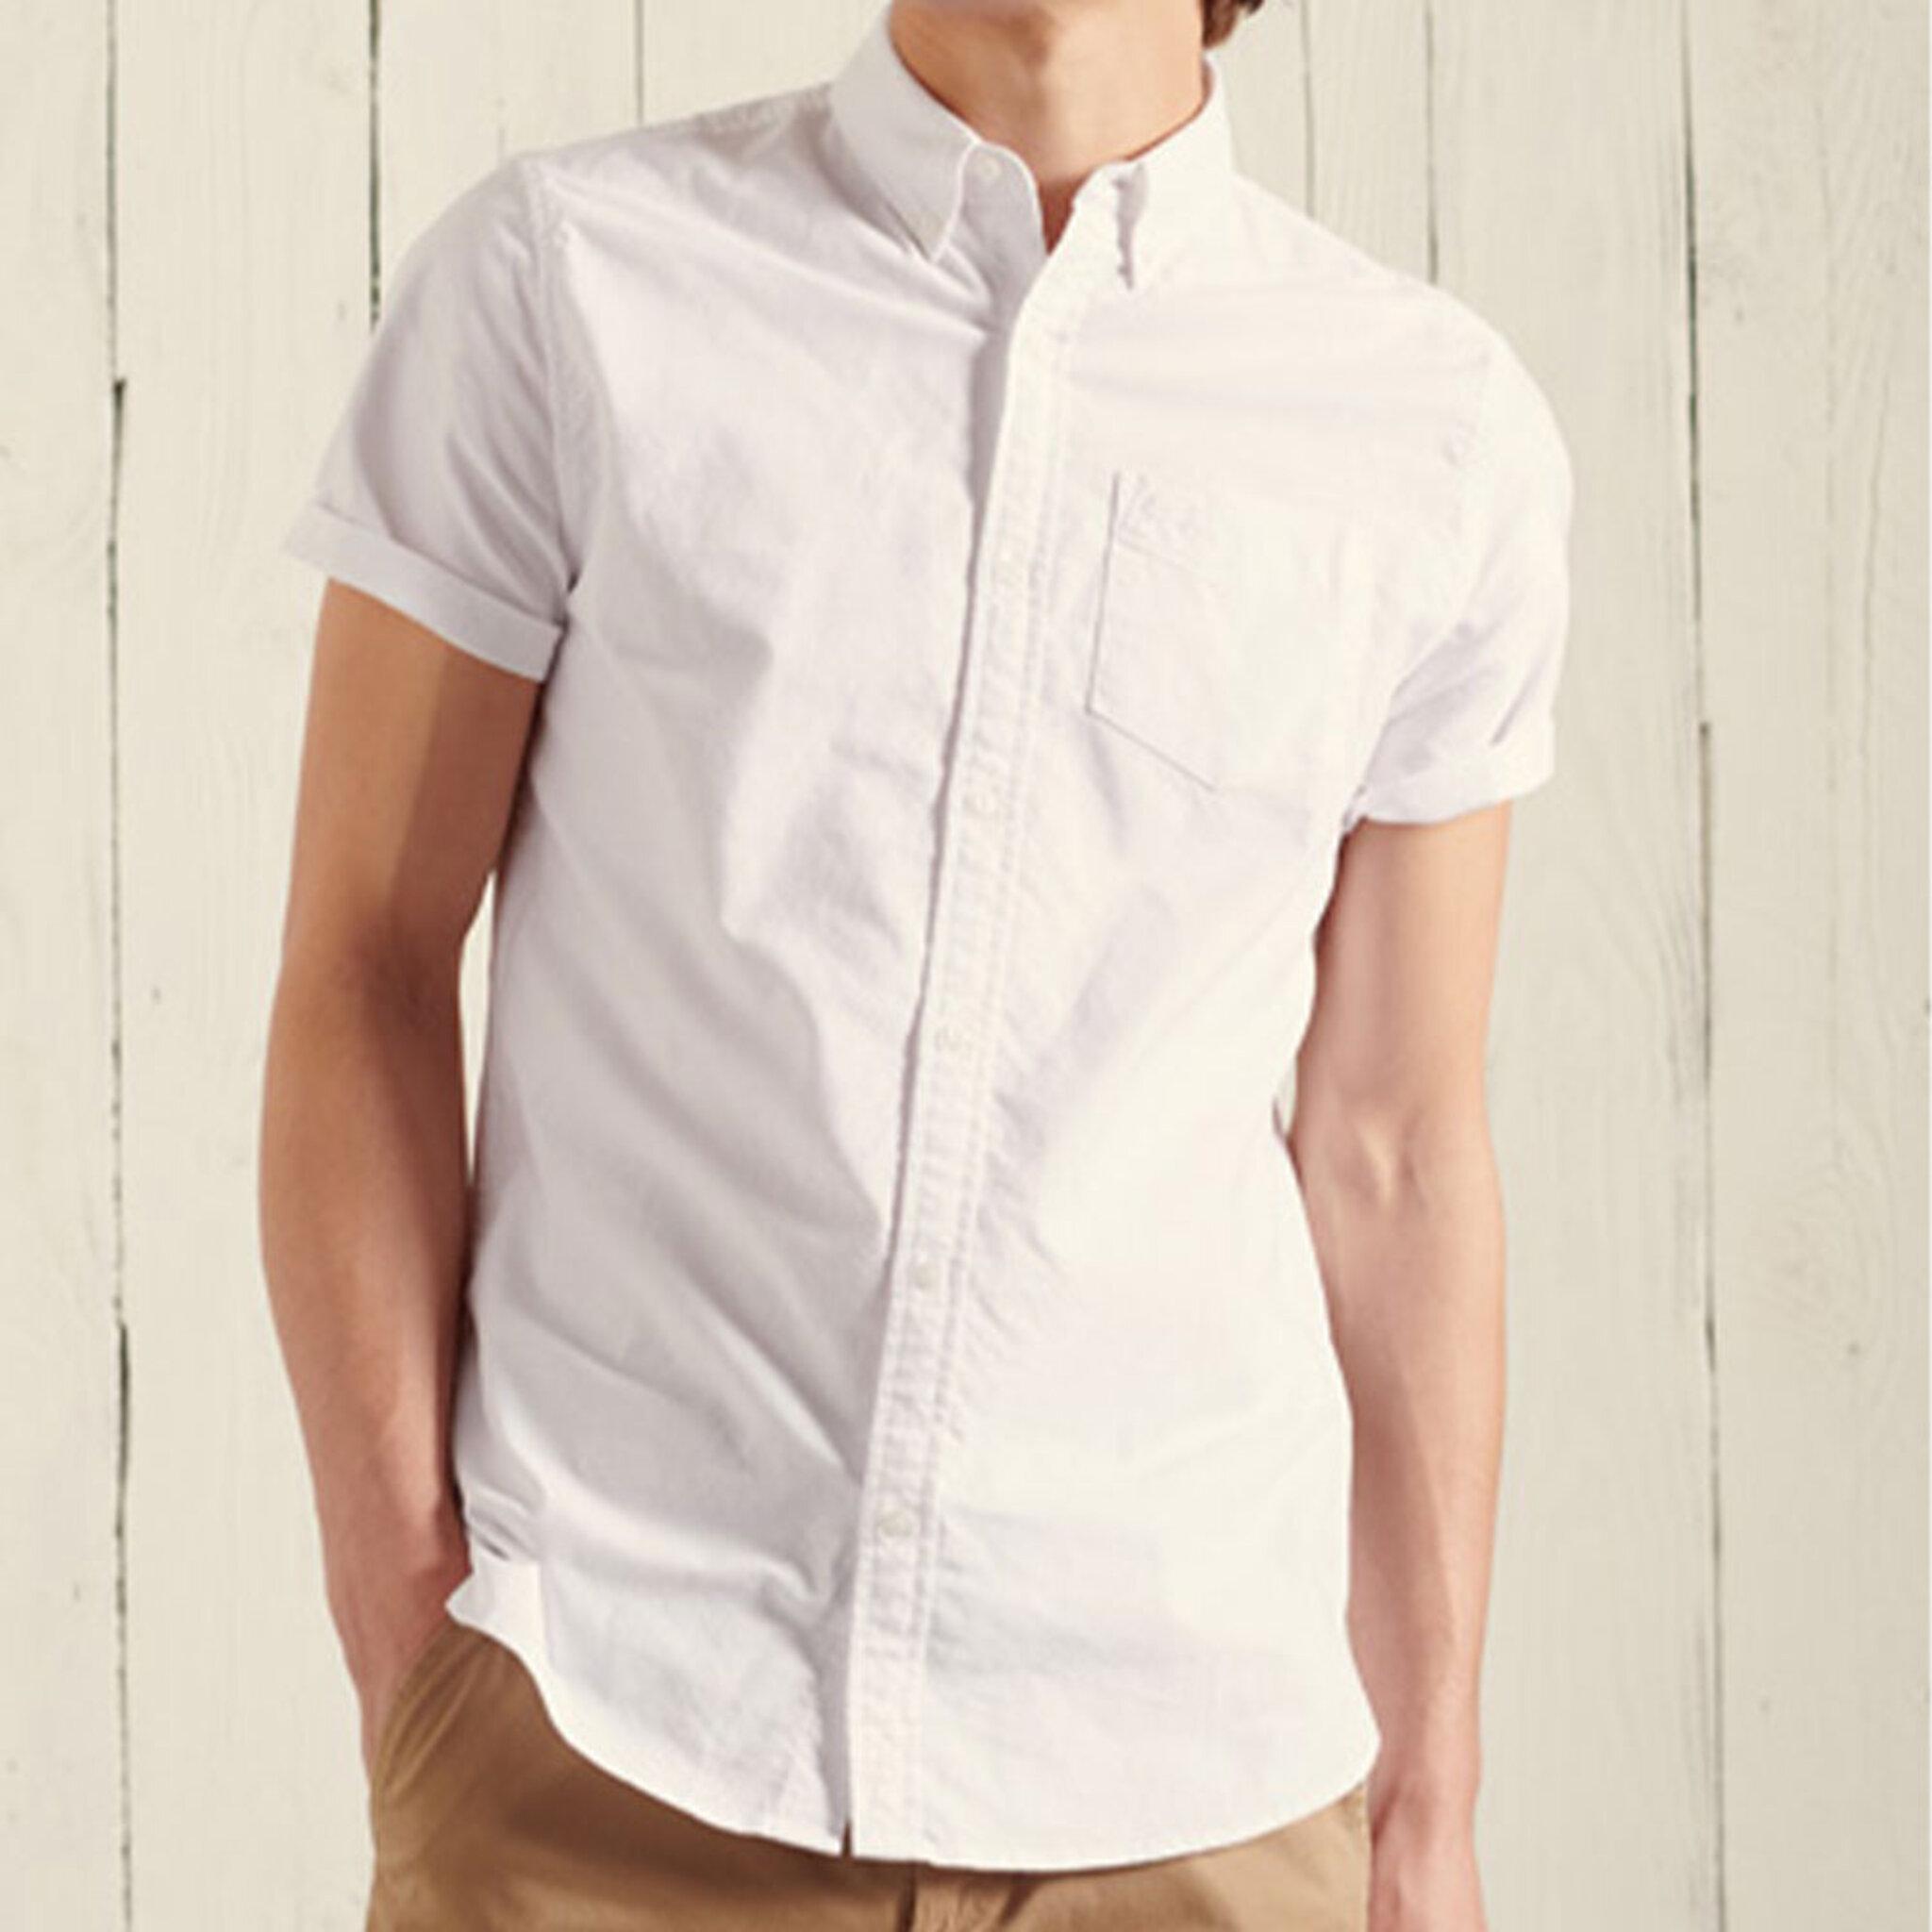 S/S Classic University Oxford Shirt